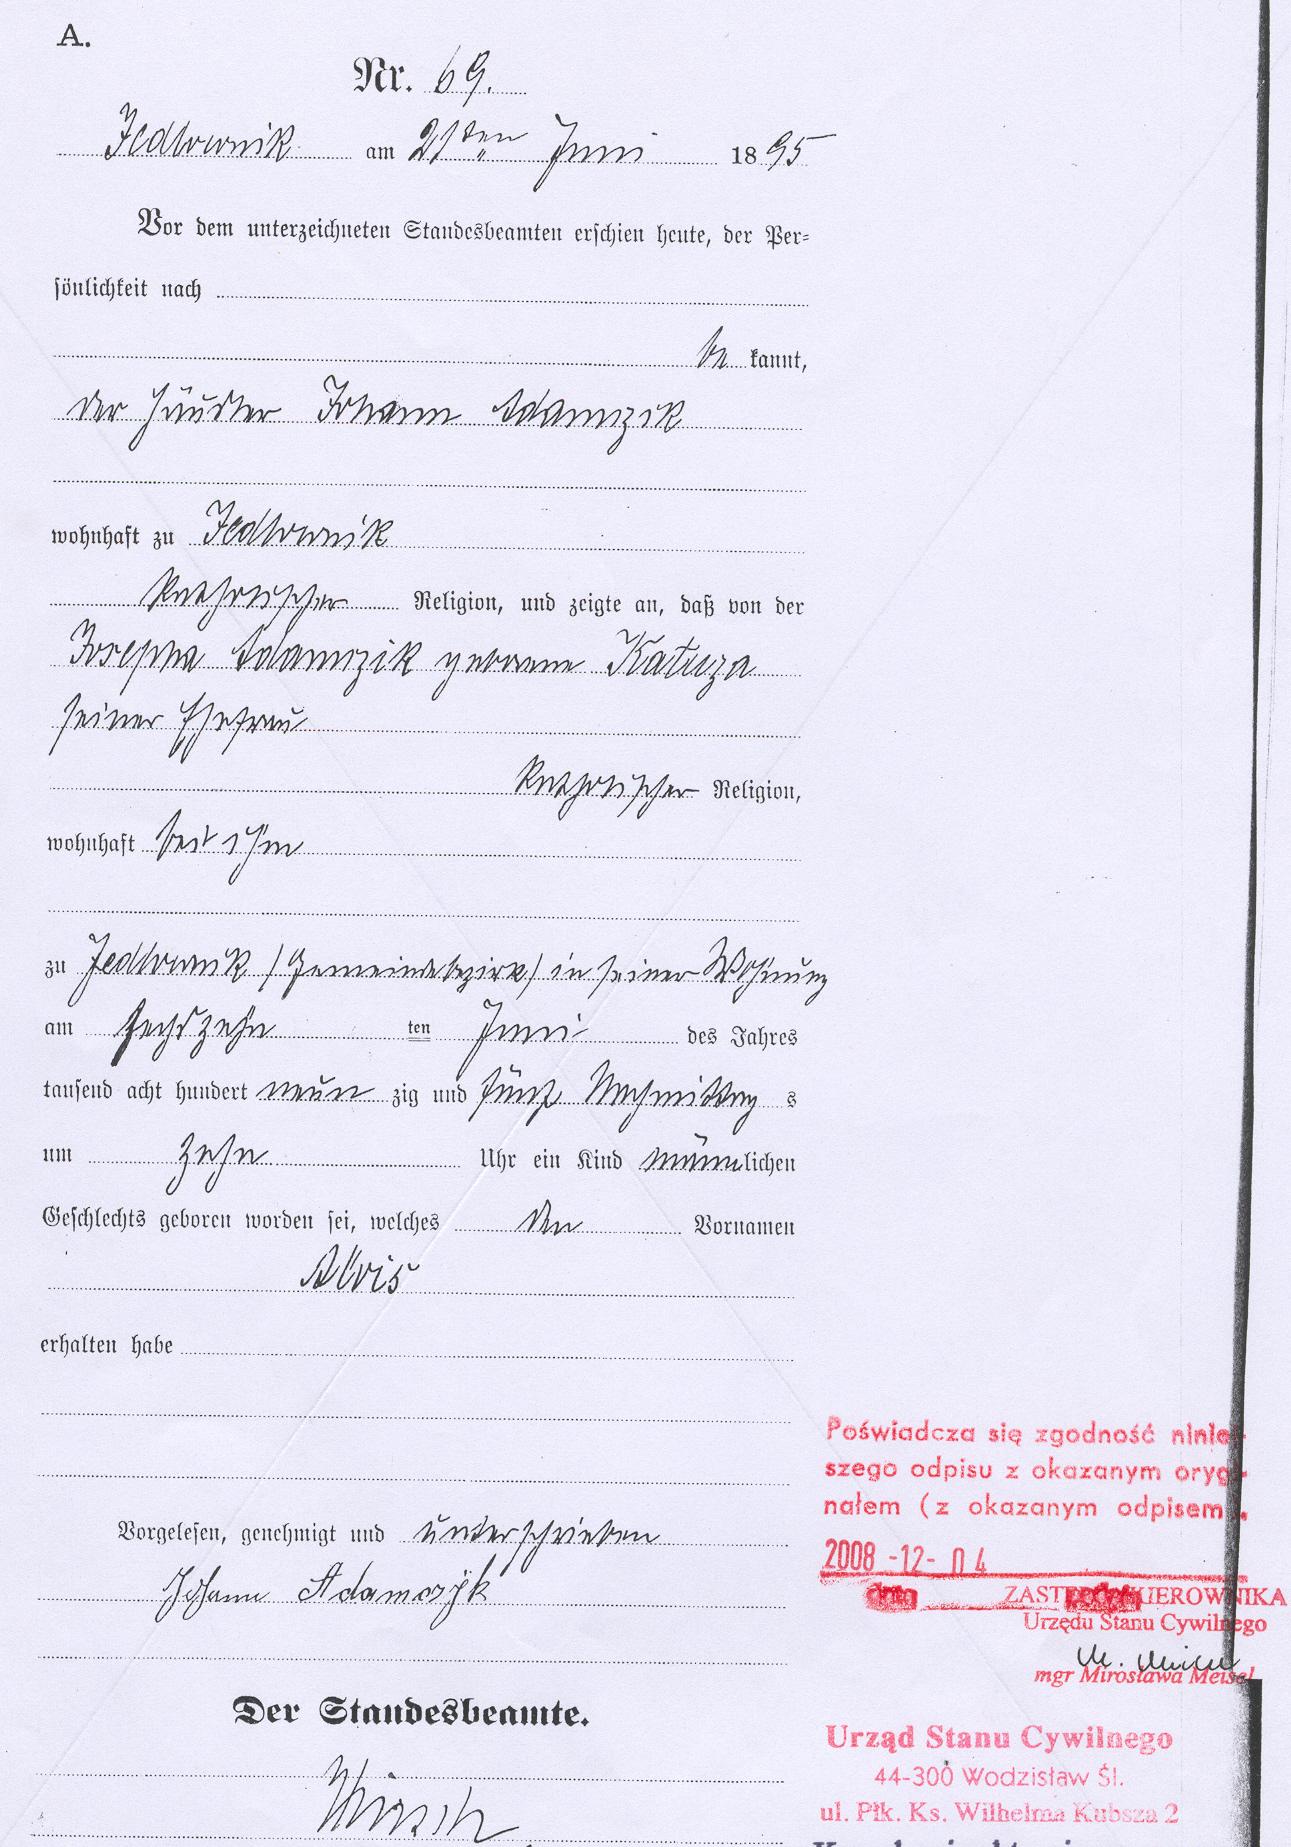 New photograph of ks birth certificate business cards and resume file alojzy alois adamczyk akt urodzenia birth certificate aiddatafo Choice Image